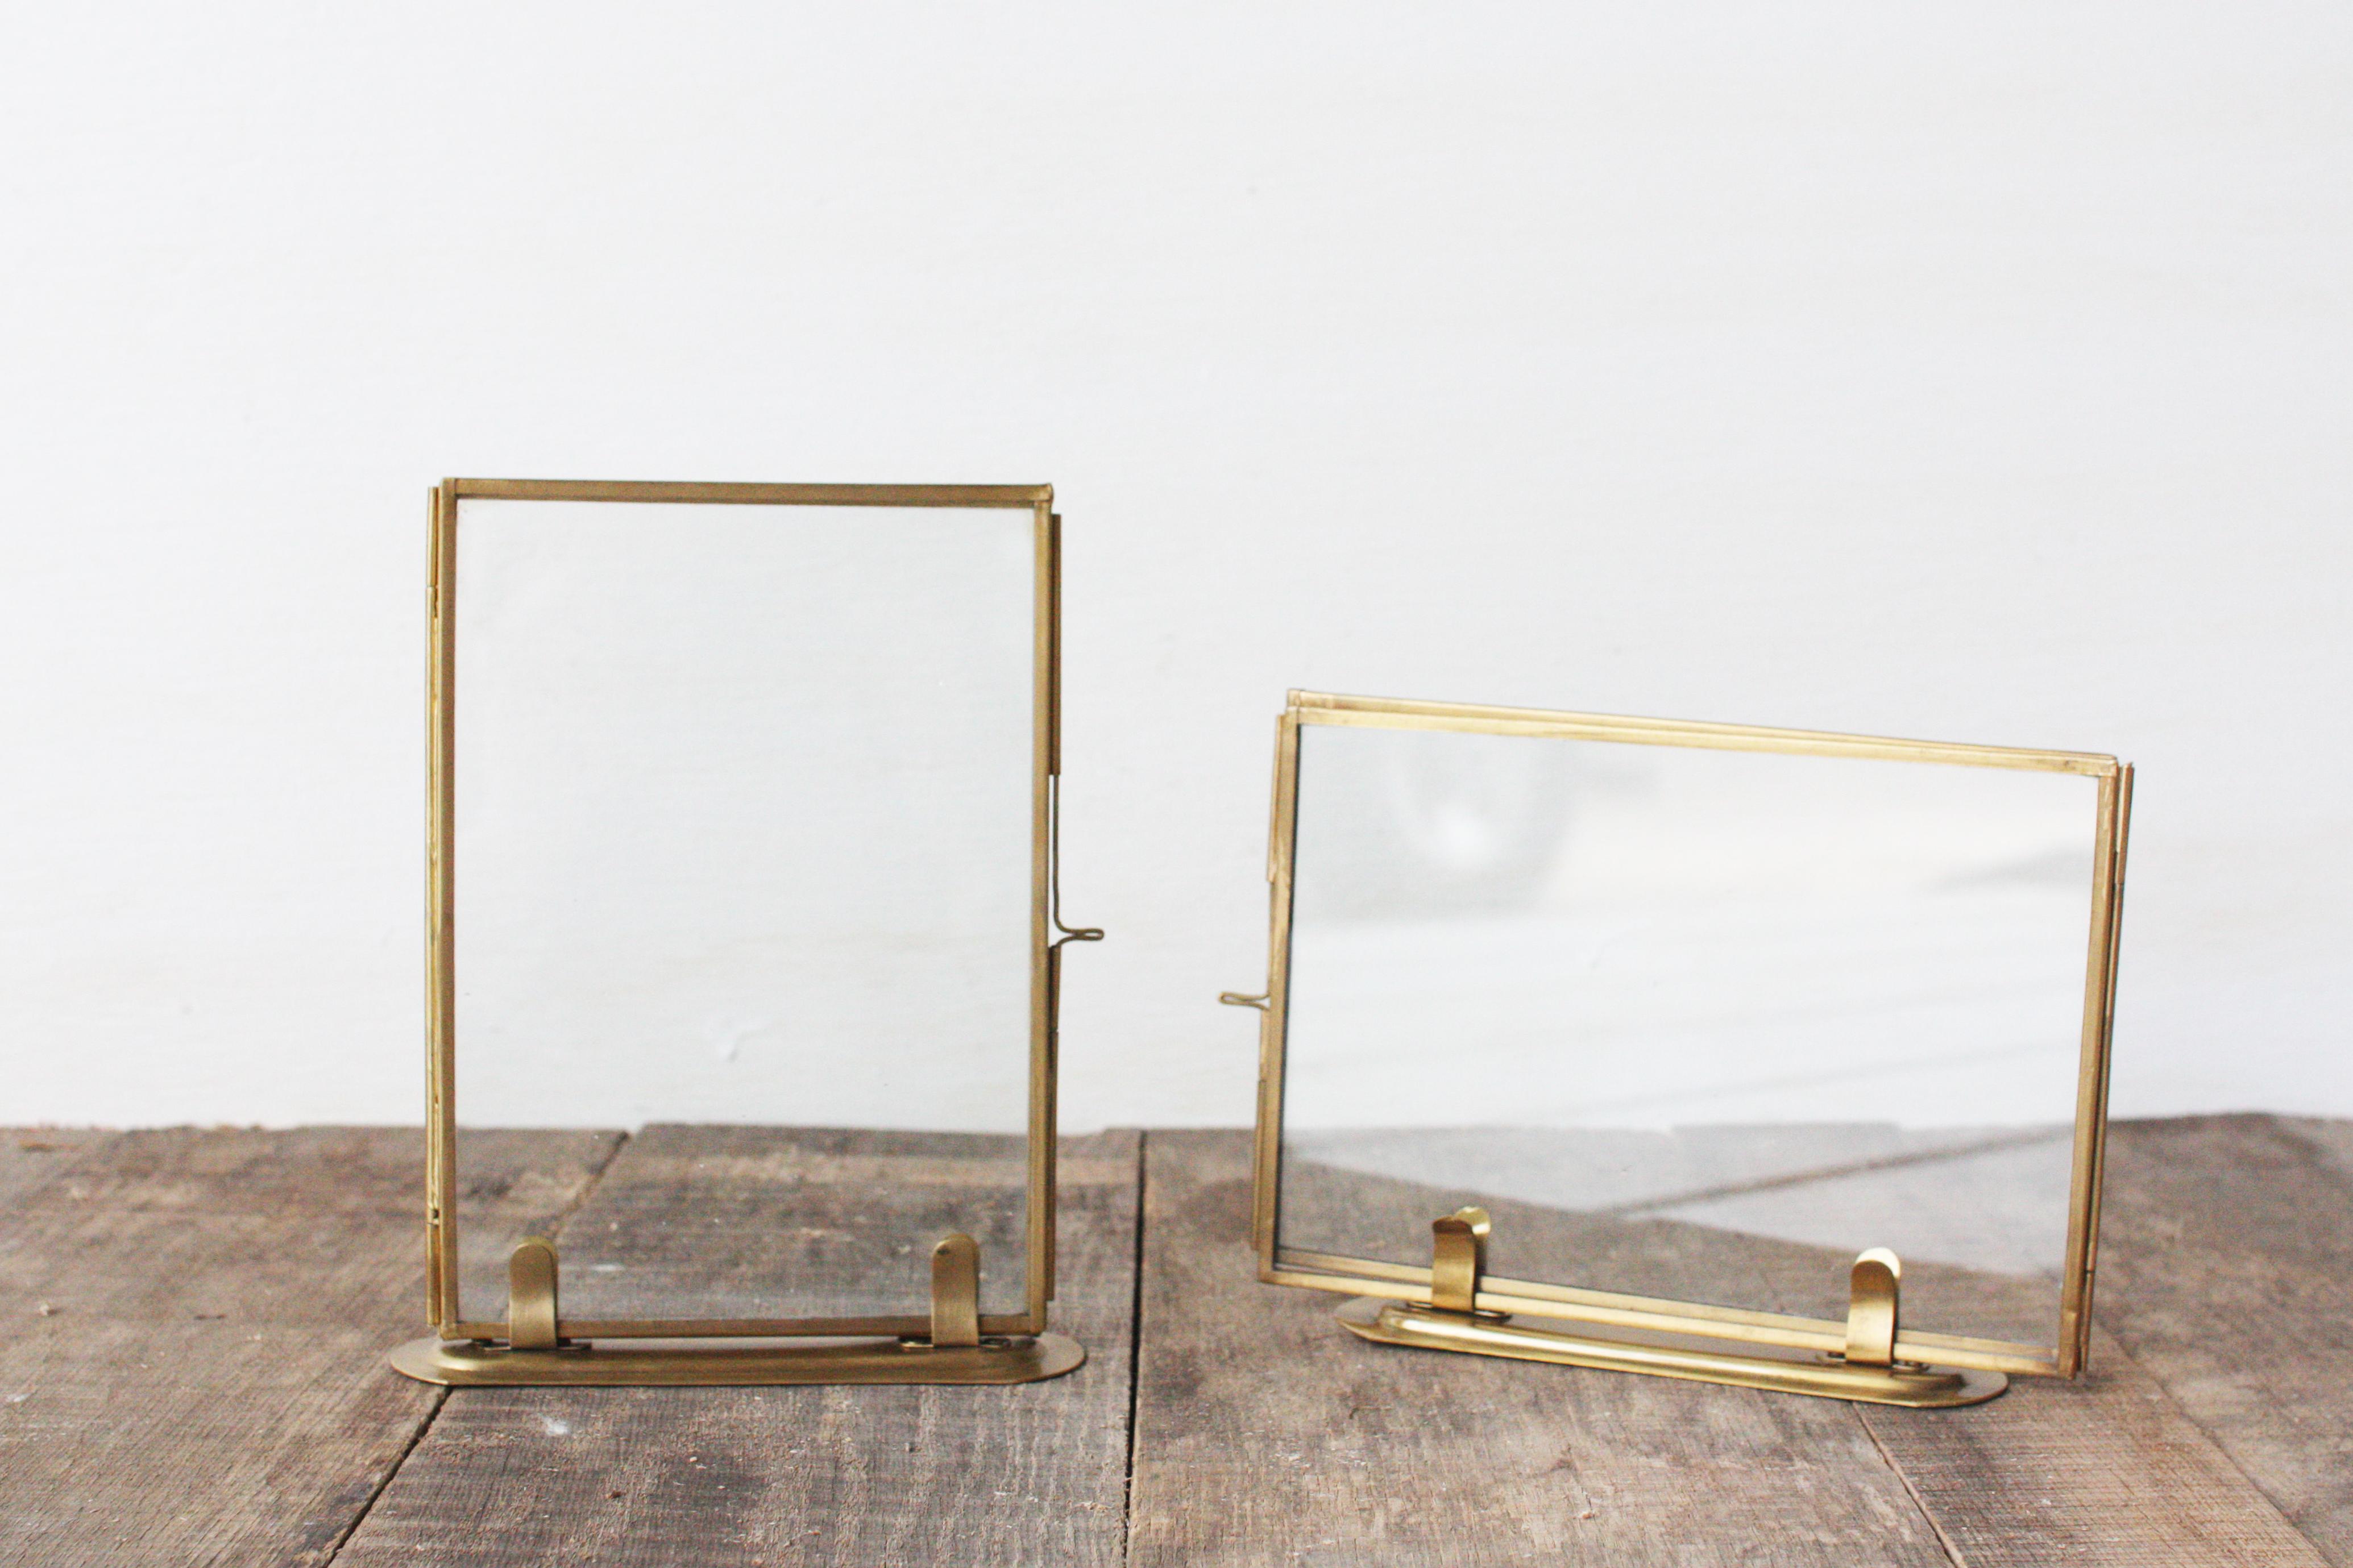 Horizontal Gold Frame - KLW Design